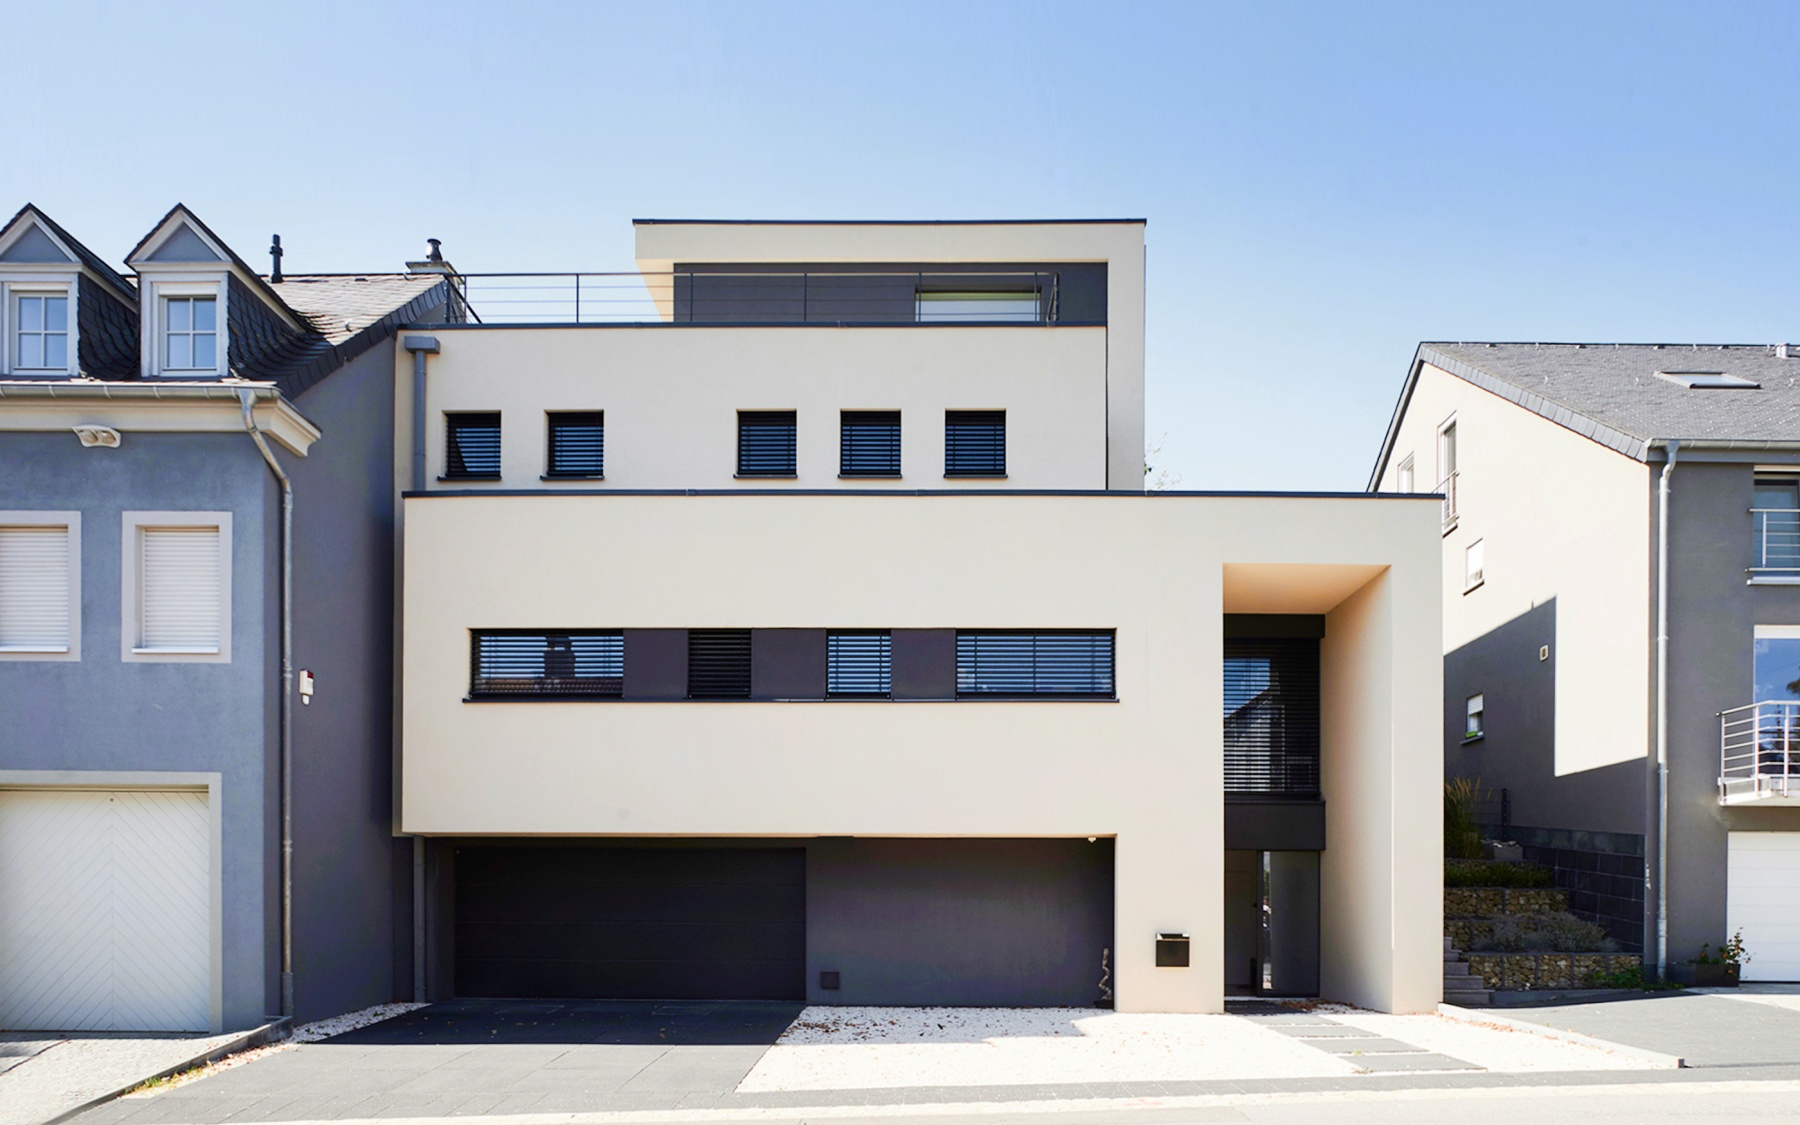 Maison à Nospelt